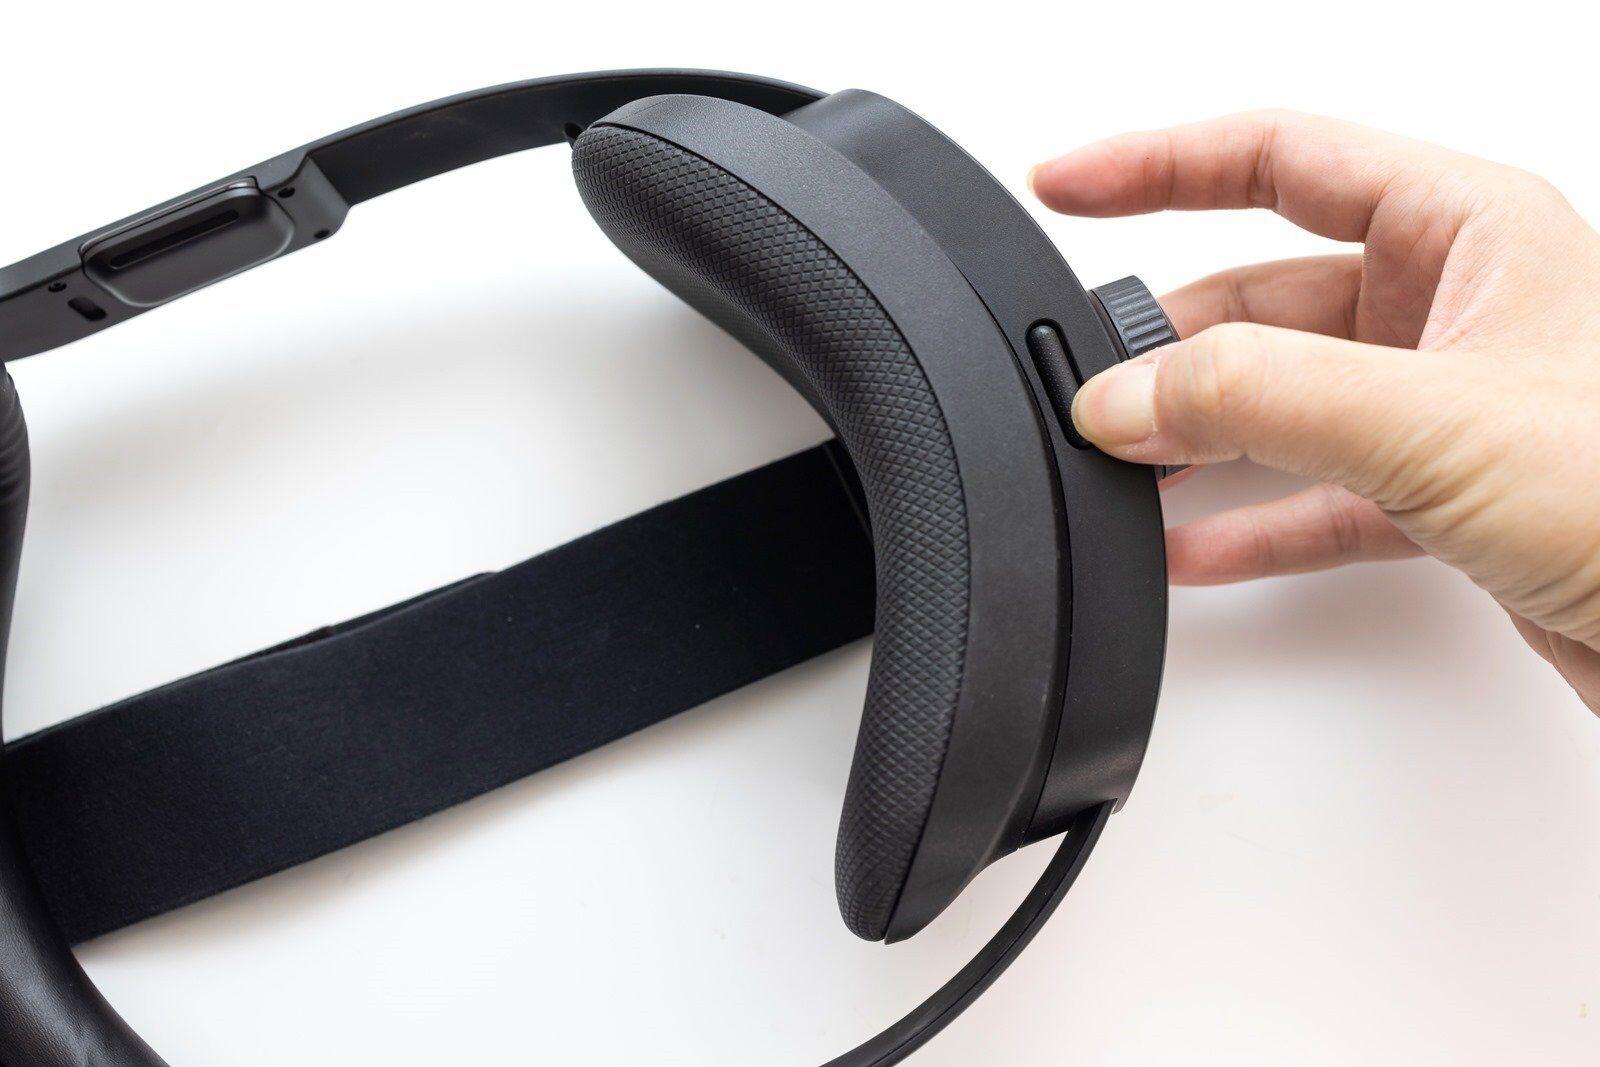 VIVE Focus 3 全球首款 5K 旗艦級 VR 一體機 (1) 開箱這就是最強 VR 一體機! @3C 達人廖阿輝